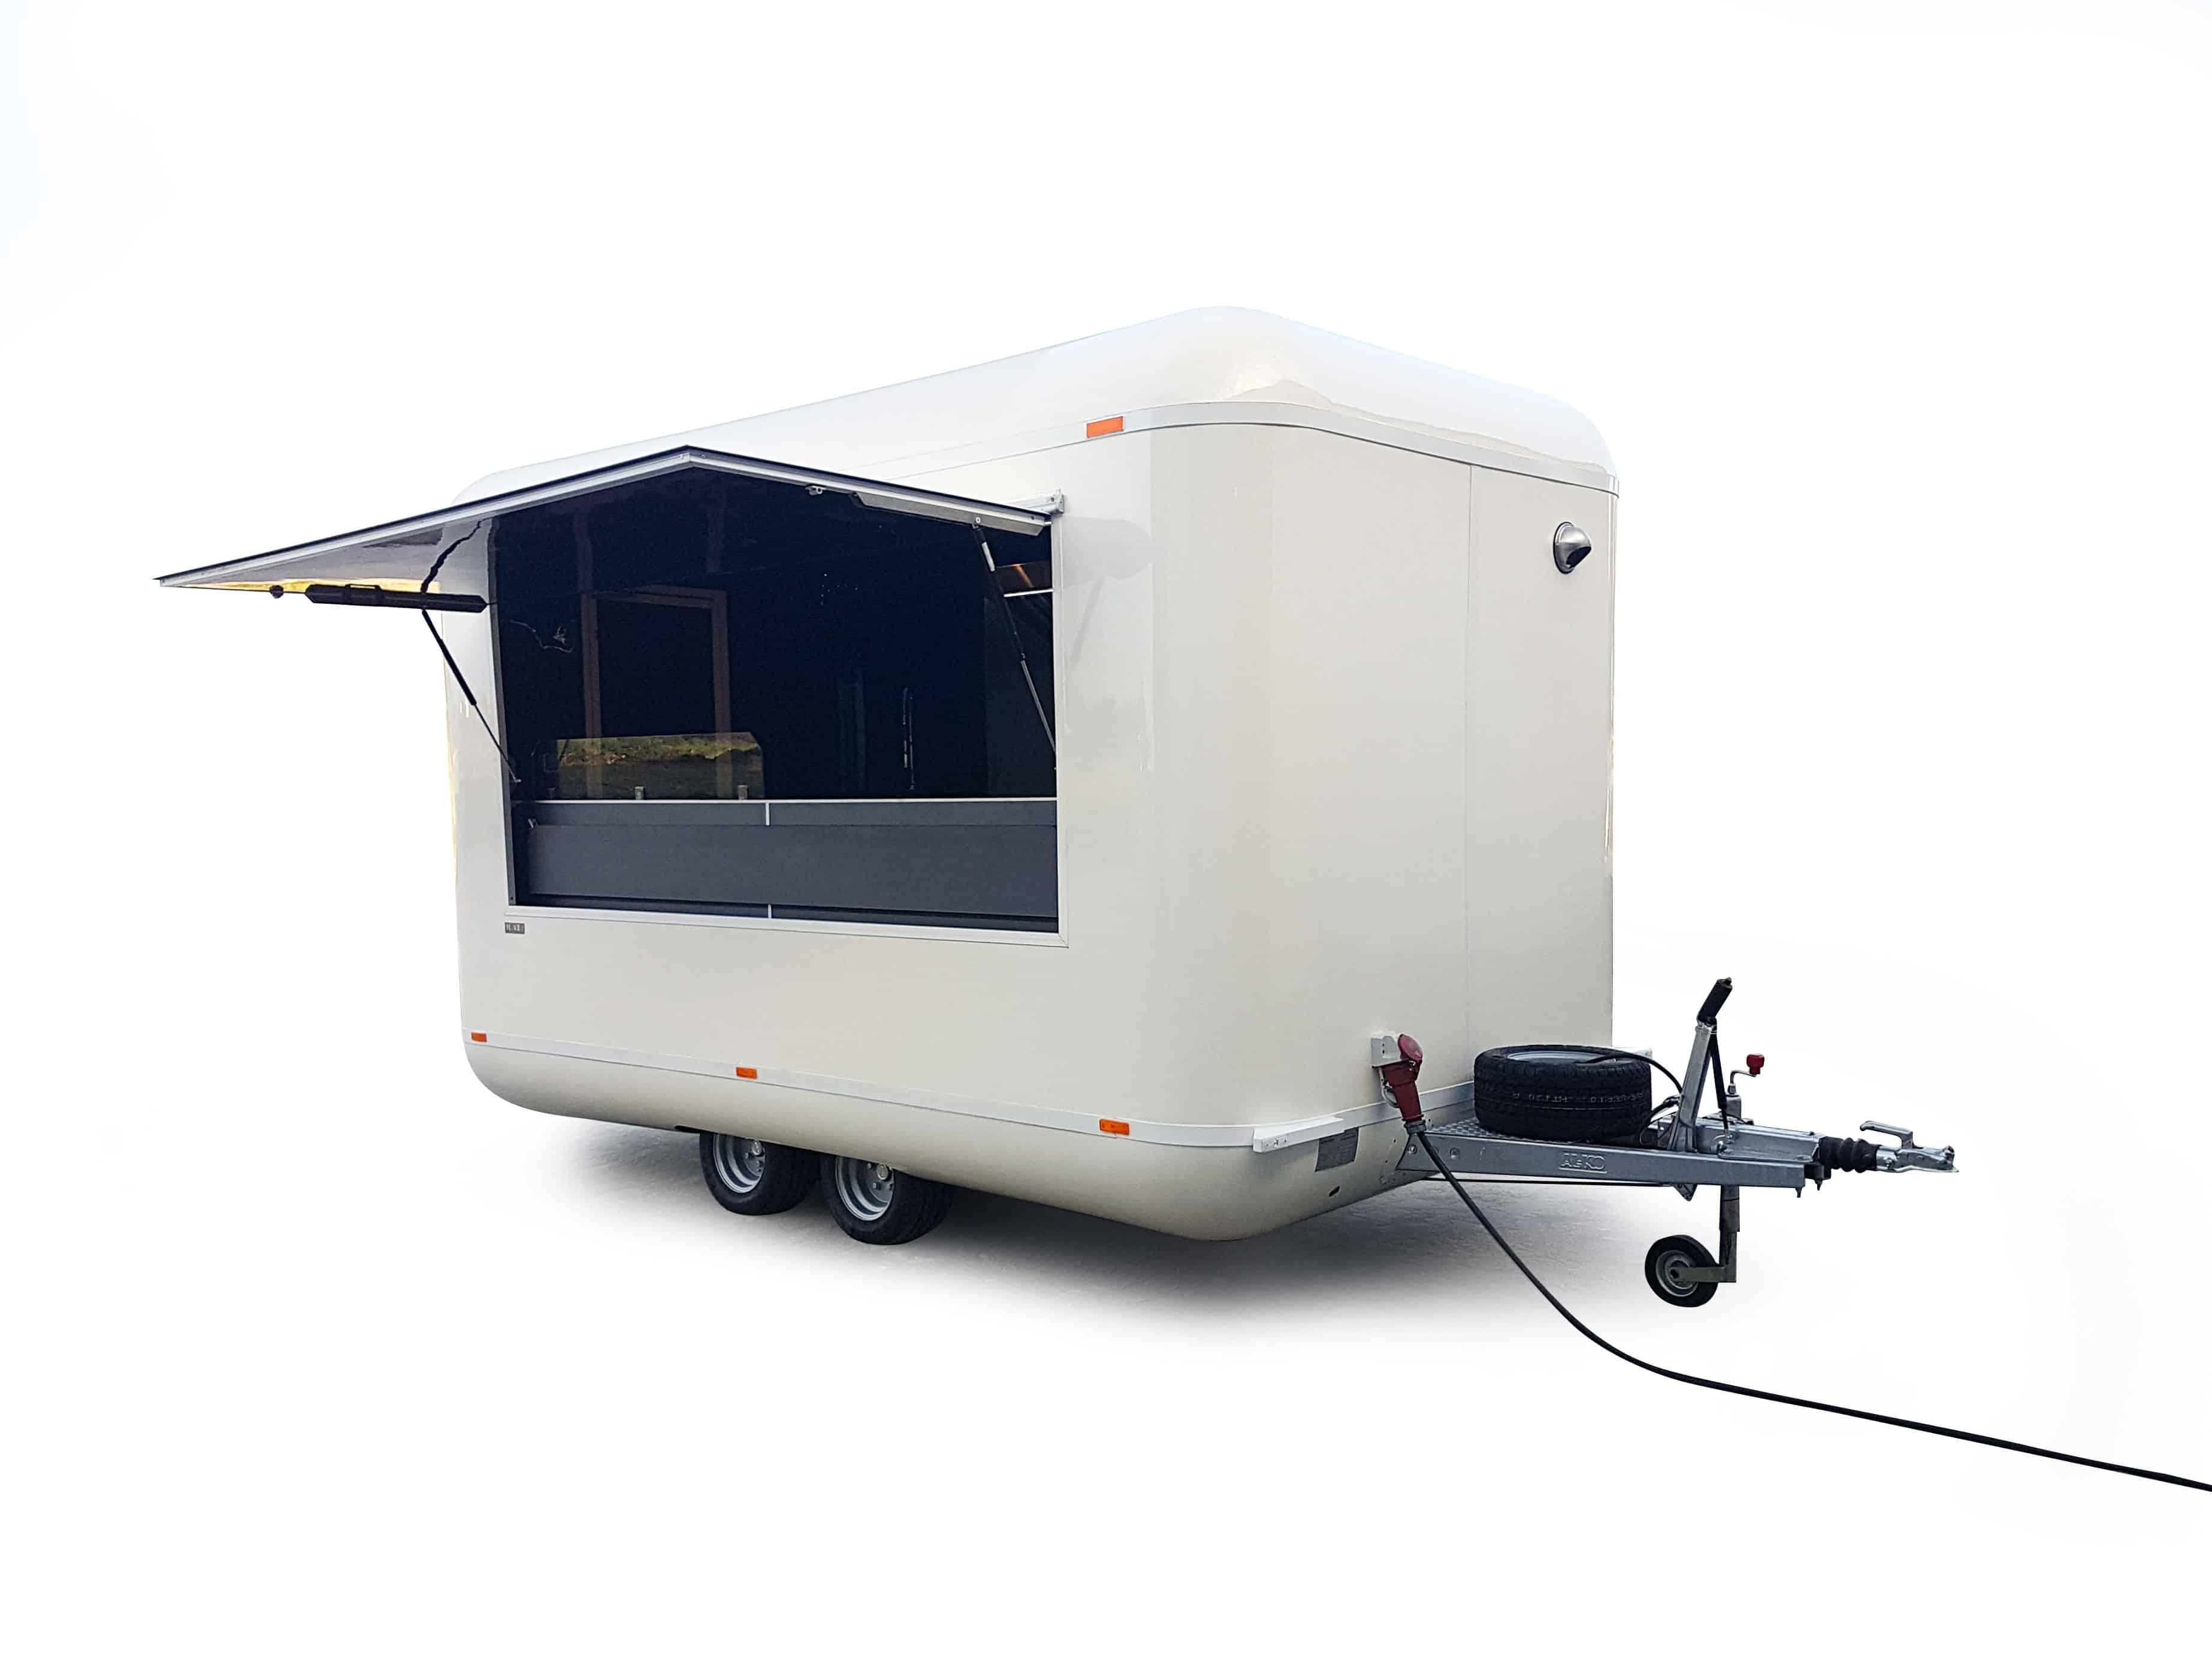 UK Cabins